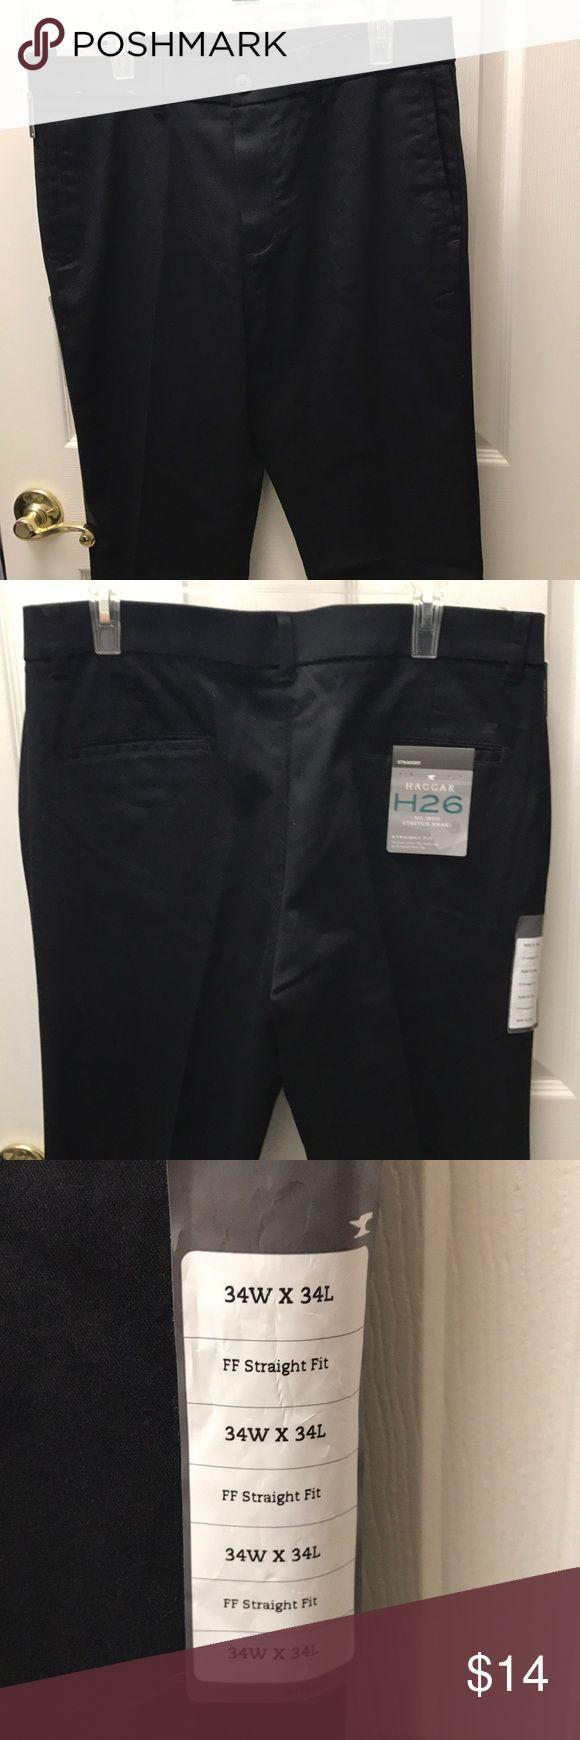 Men's Haggar  Cotton Dress Pants New Hagar No Iron Stretch Khaki for men in size 34X34 Haggar Pants Chinos & Khakis